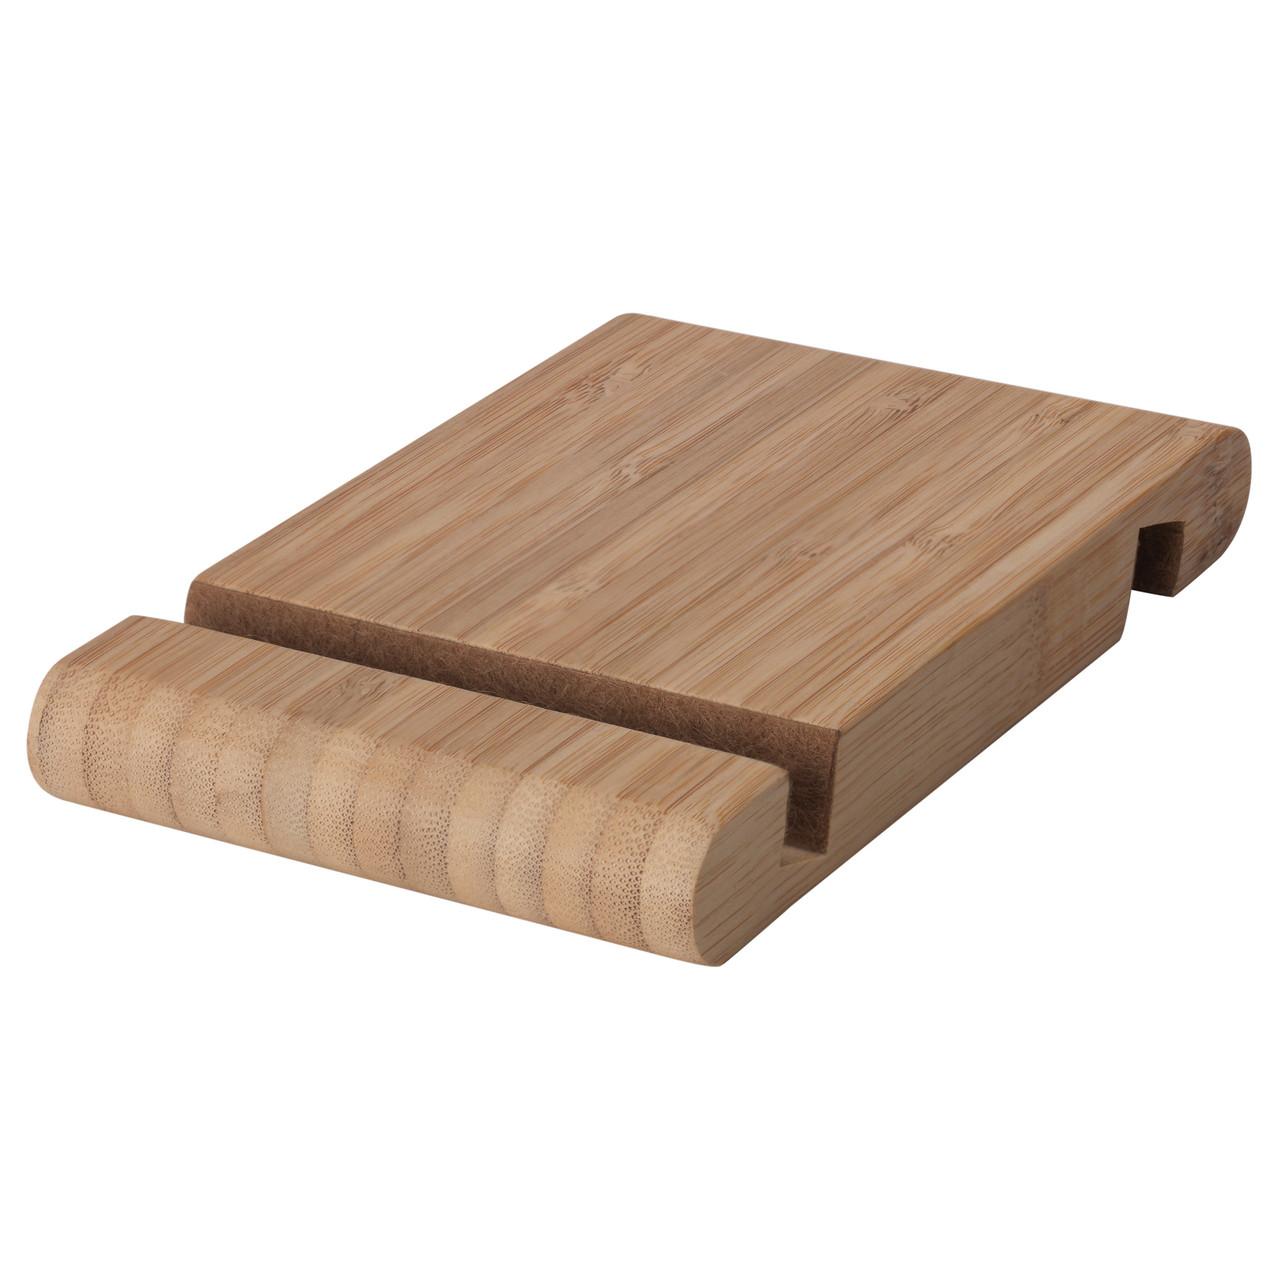 БЕРГЕНЕС Держатель для телефона/планшета, бамбук, 10457999, ИКЕА, IKEA, BERGENES